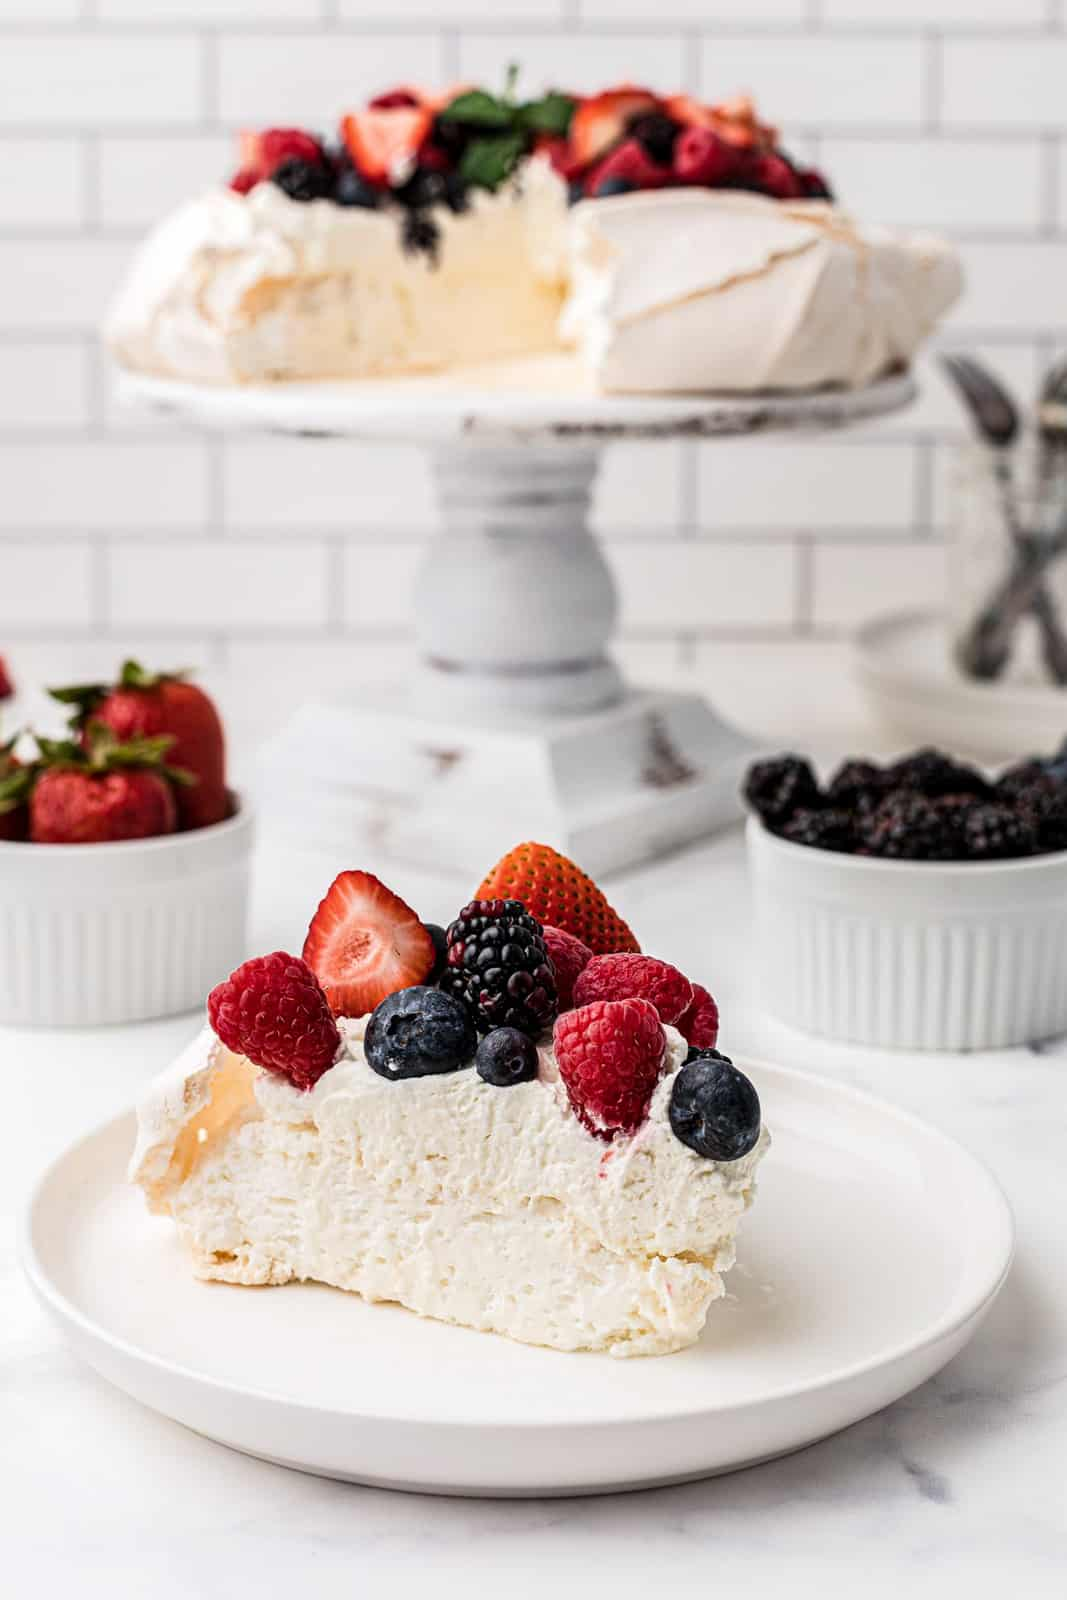 Slice of Pavlova on white plate with full Pavlova Recipe in background